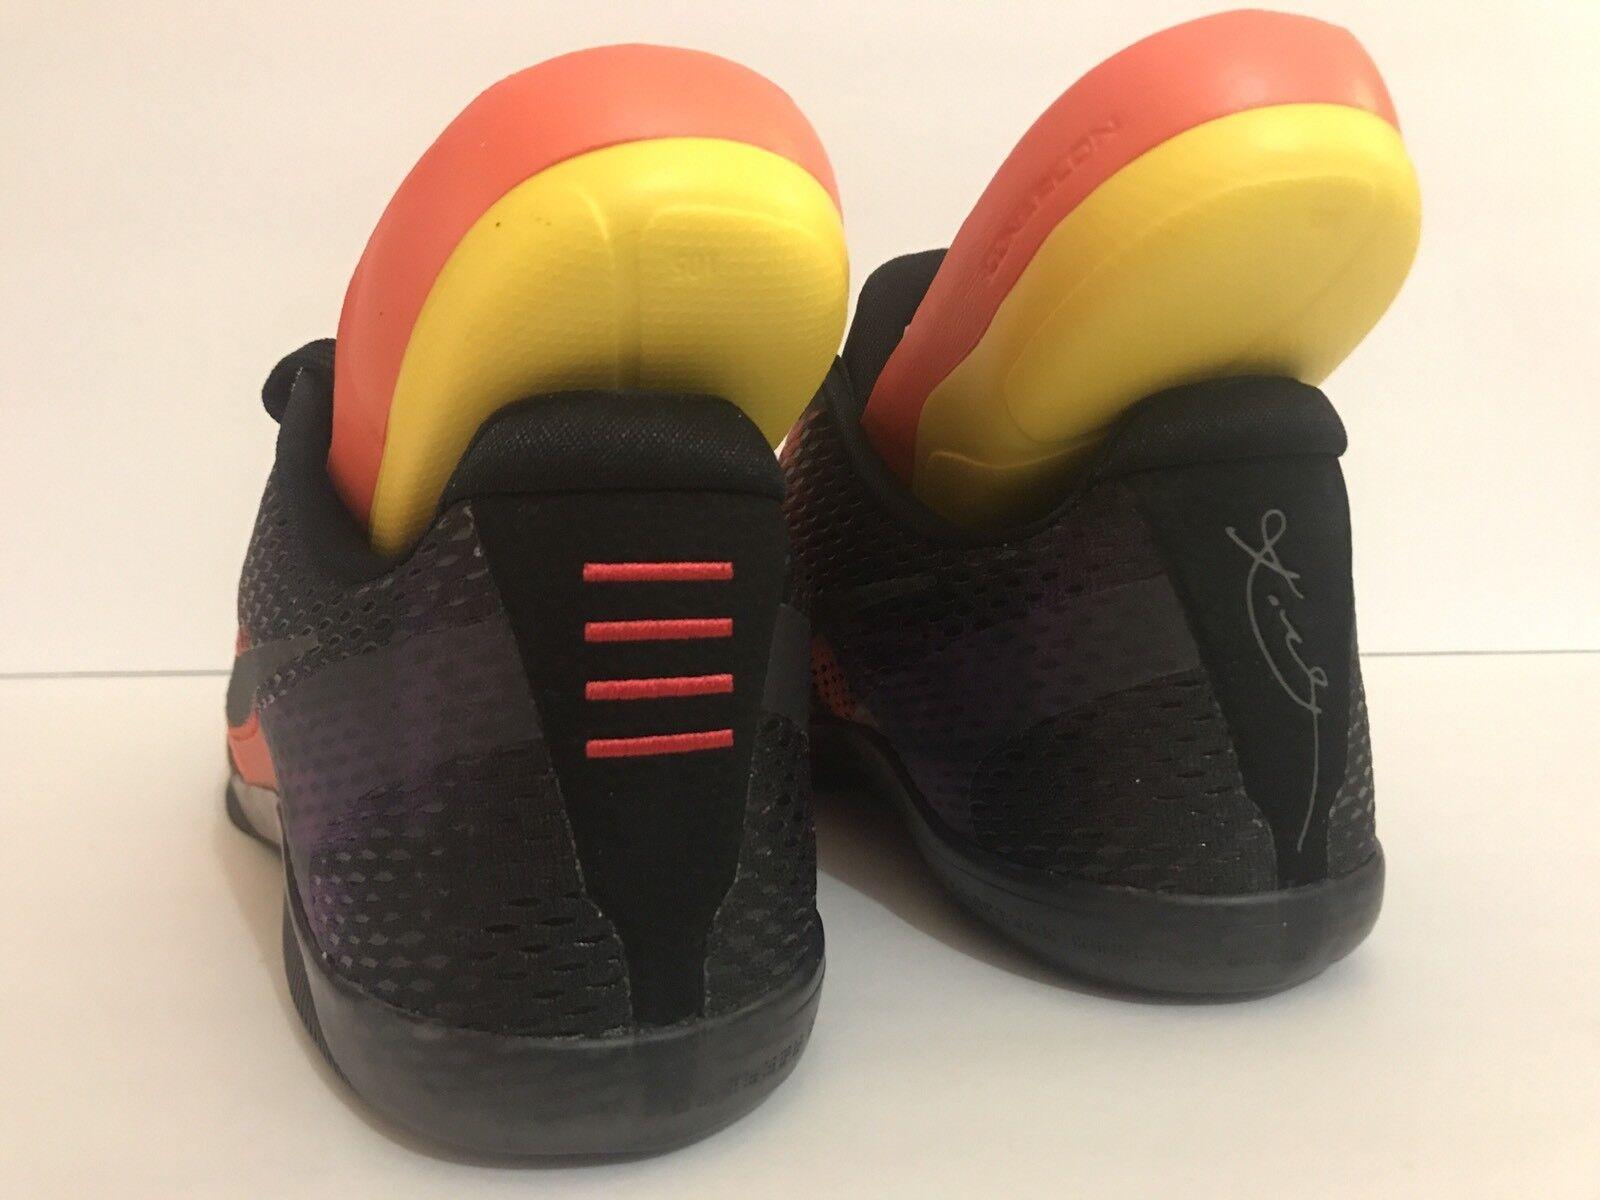 Nike 836183-805 kobe xi asteroiden sonnenuntergang 836183-805 Nike sz 10,5 0acdb3